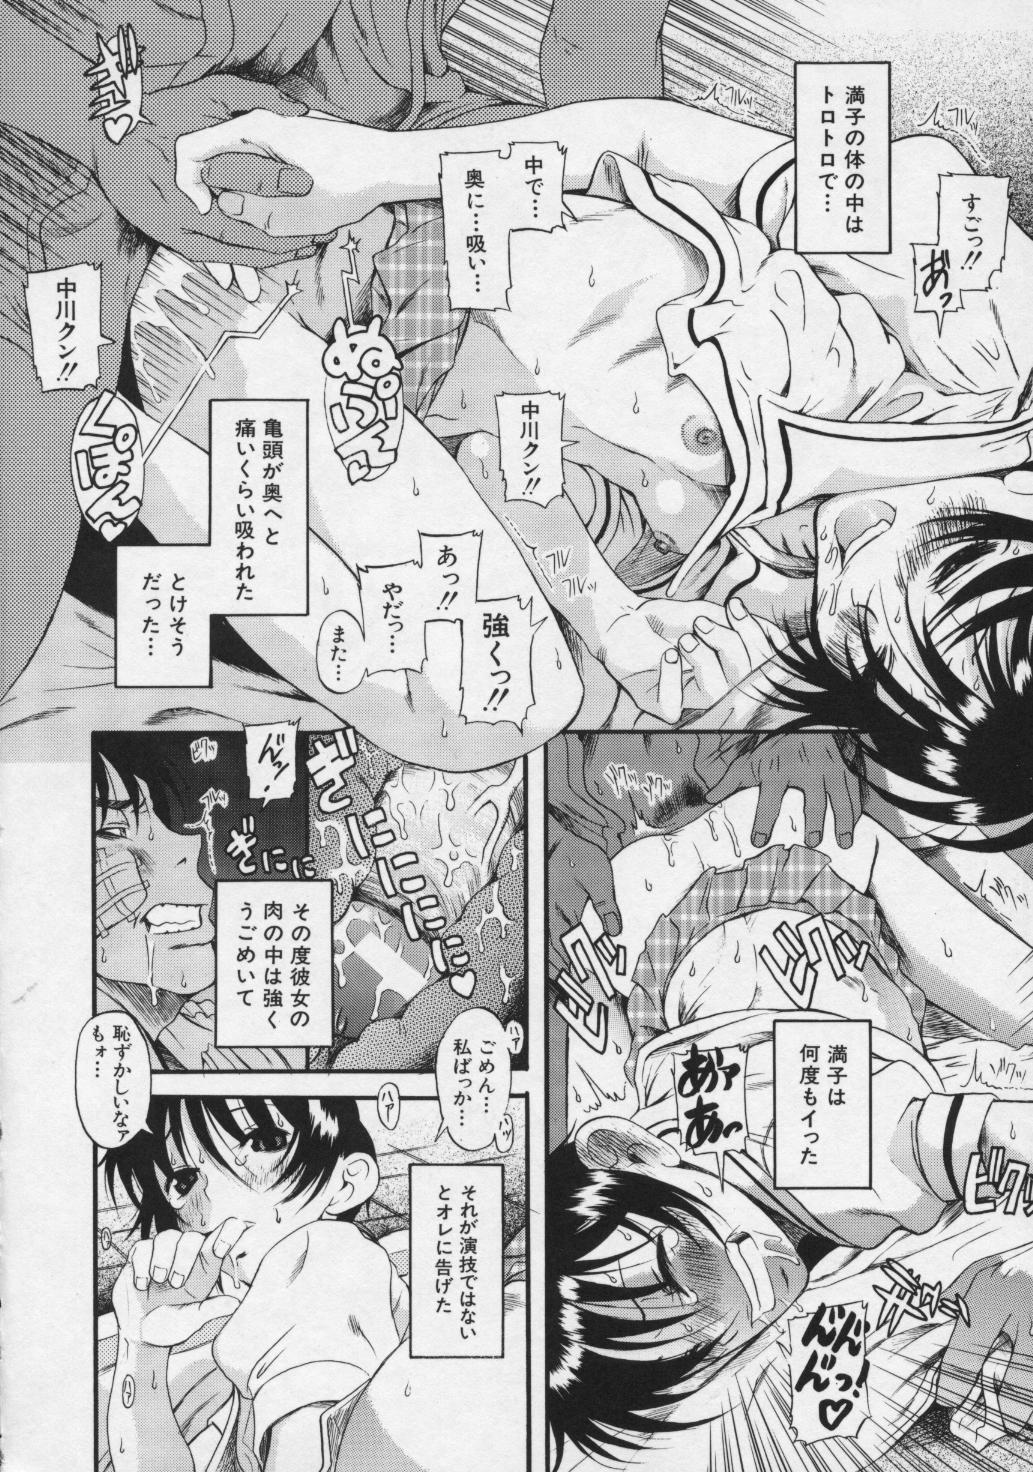 Kimi no Na o Yobeba - If I call your name. 91